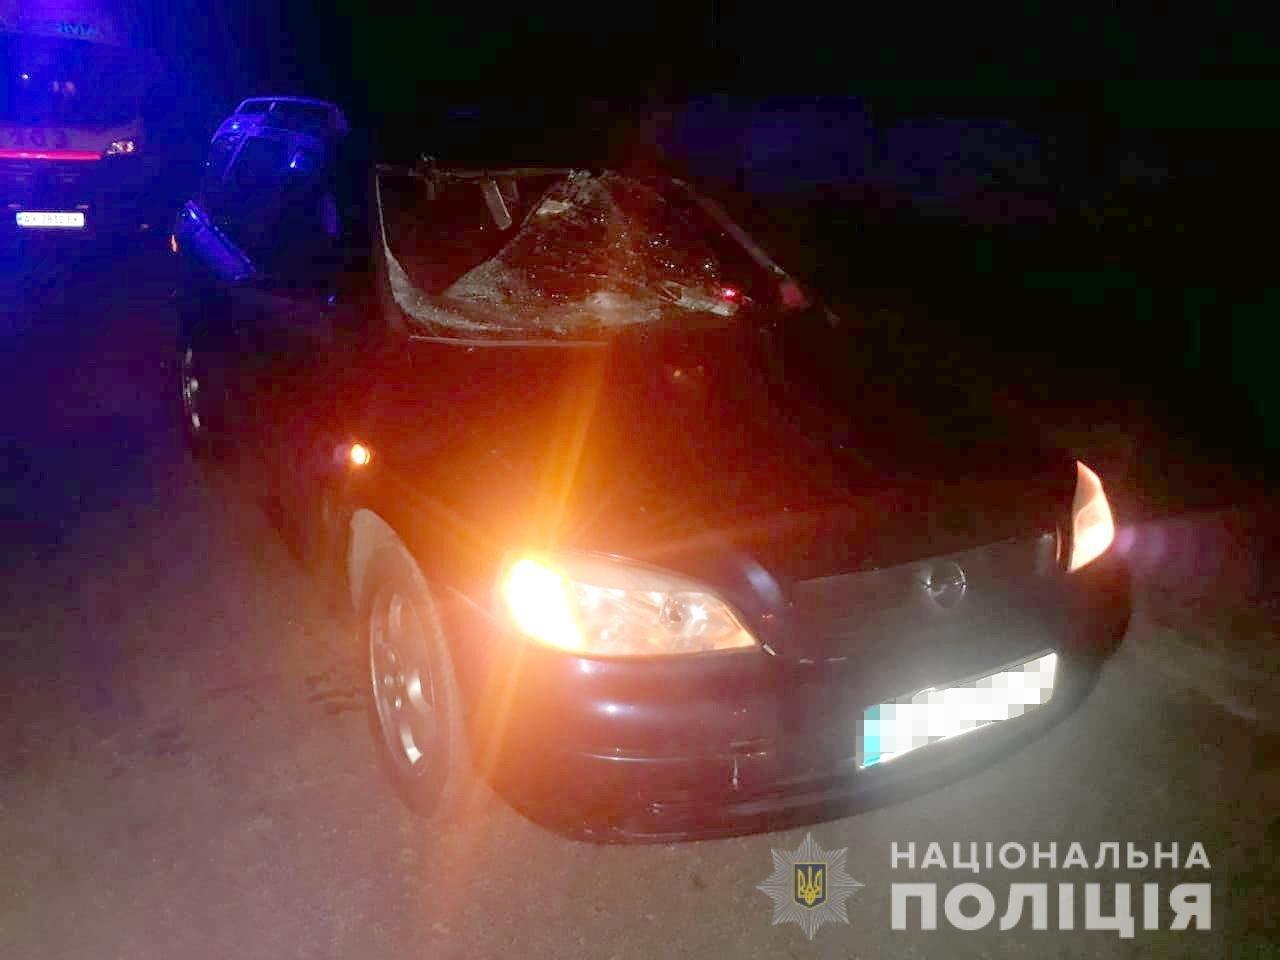 На Харьковщине во время ДТП погибли три человека, - ФОТО, фото-1